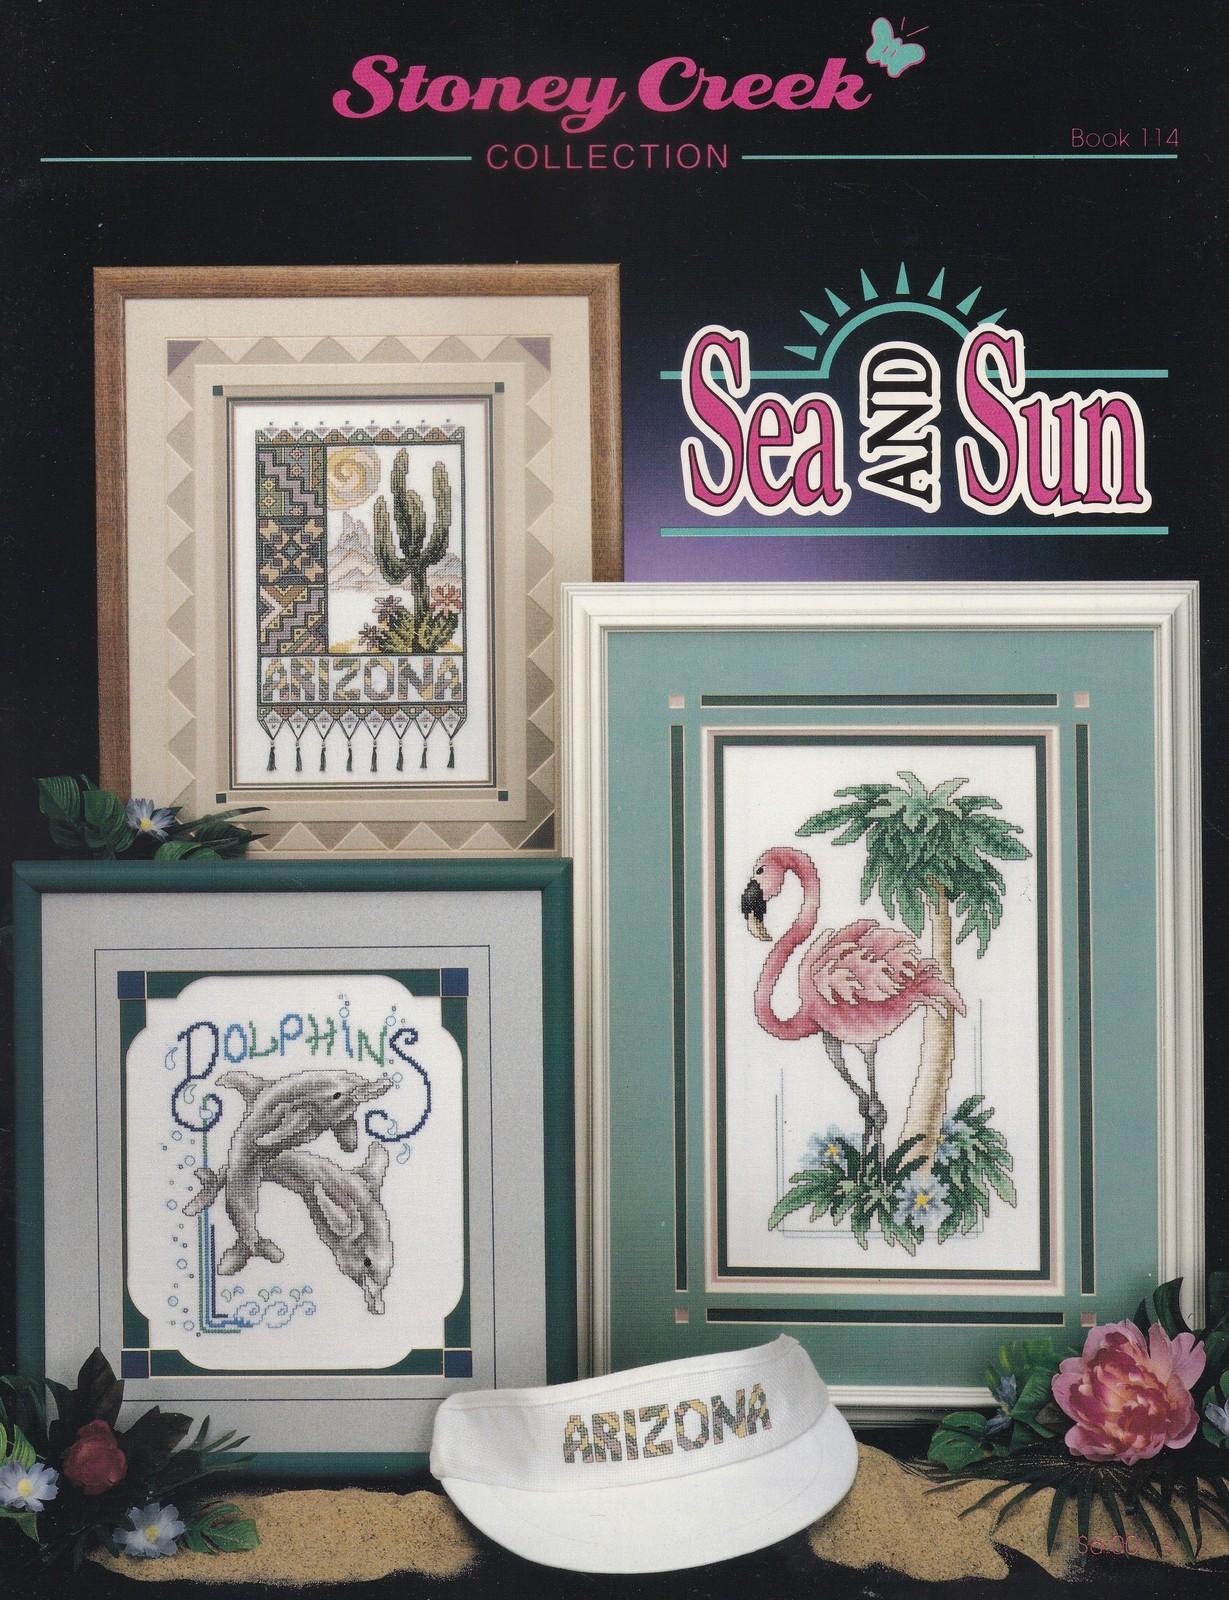 Sea and Sun, Stoney Creek Cross Stitch Pattern Book 114 Dolphin Manatee Flamingo